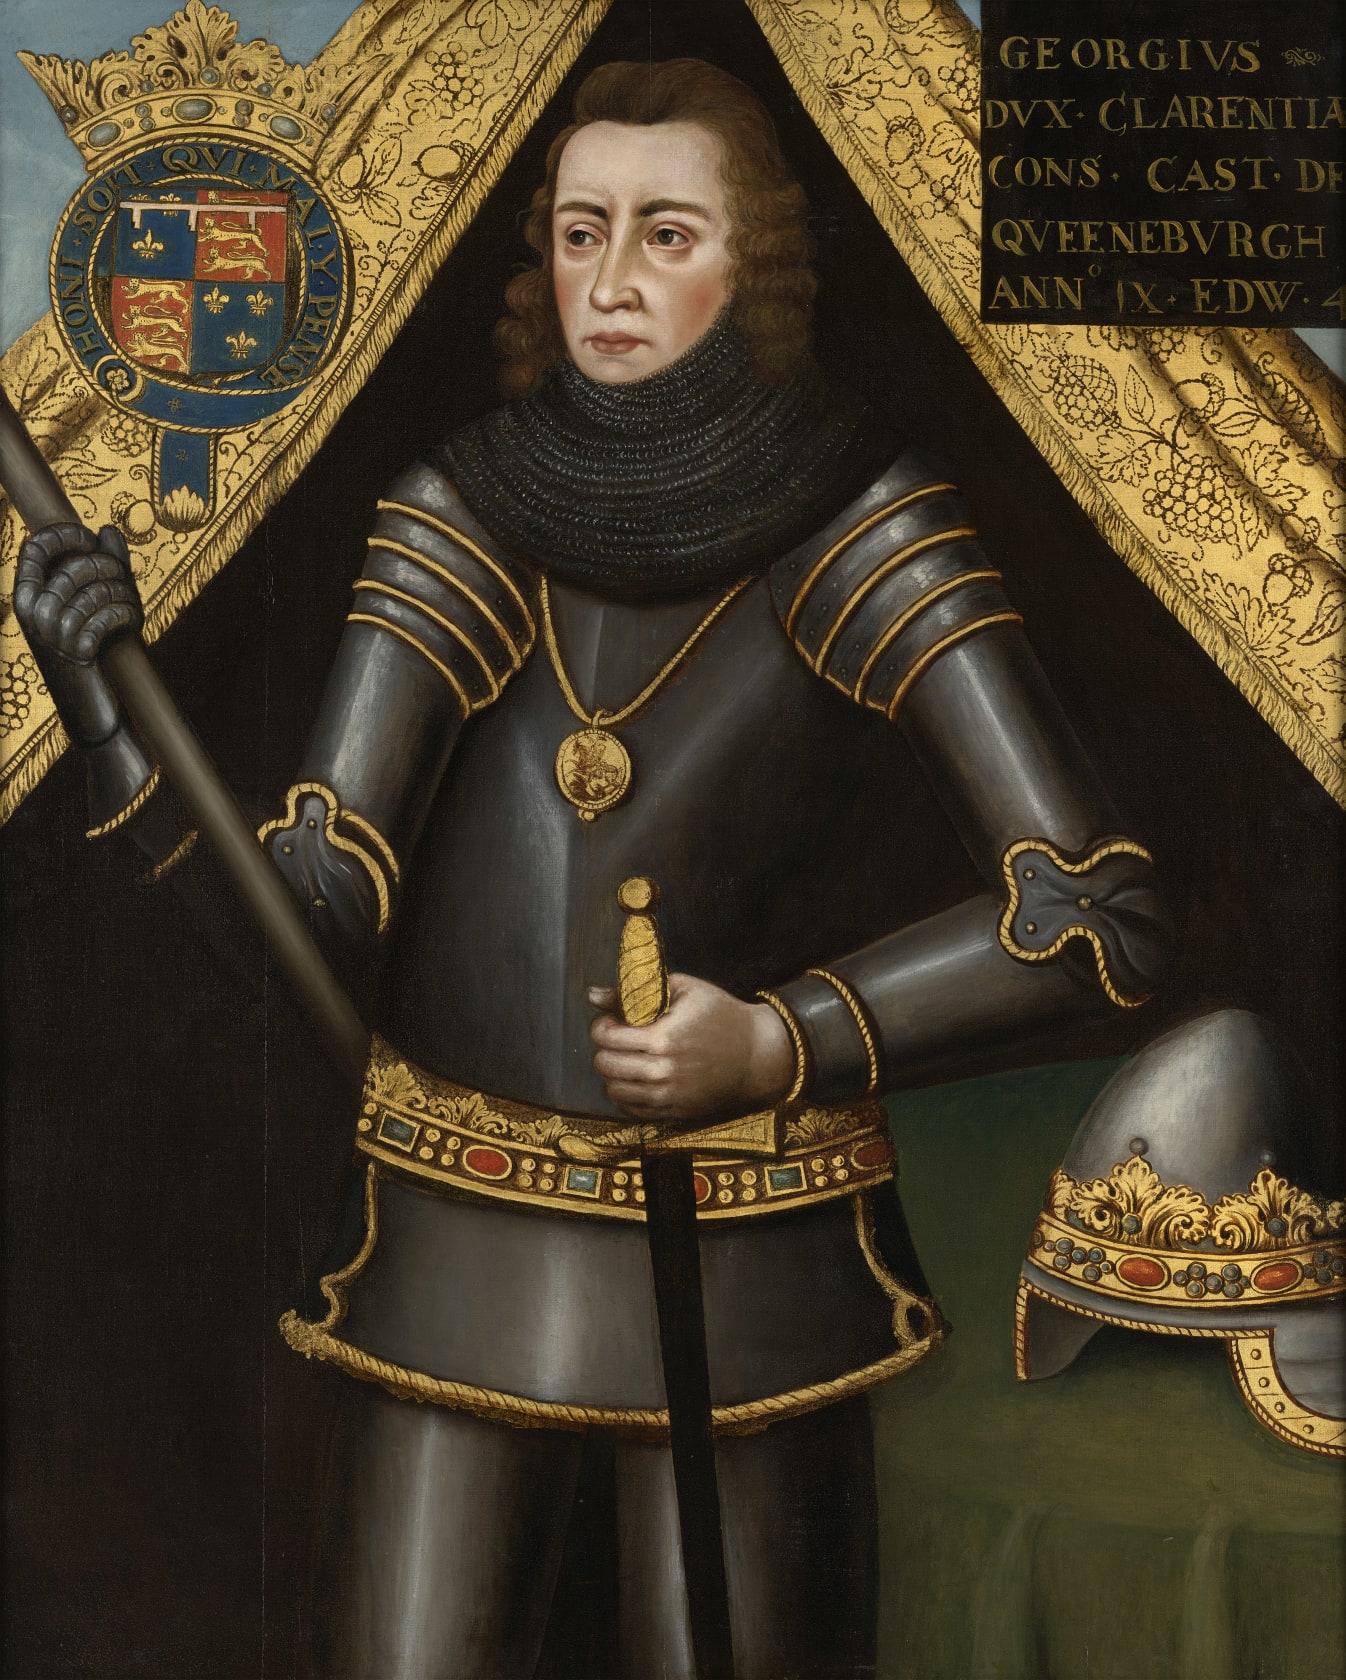 English School | Portrait of George Plantagenet, 1st Duke of Clarence  (1449-1478), K.G. | Philip Mould & Company